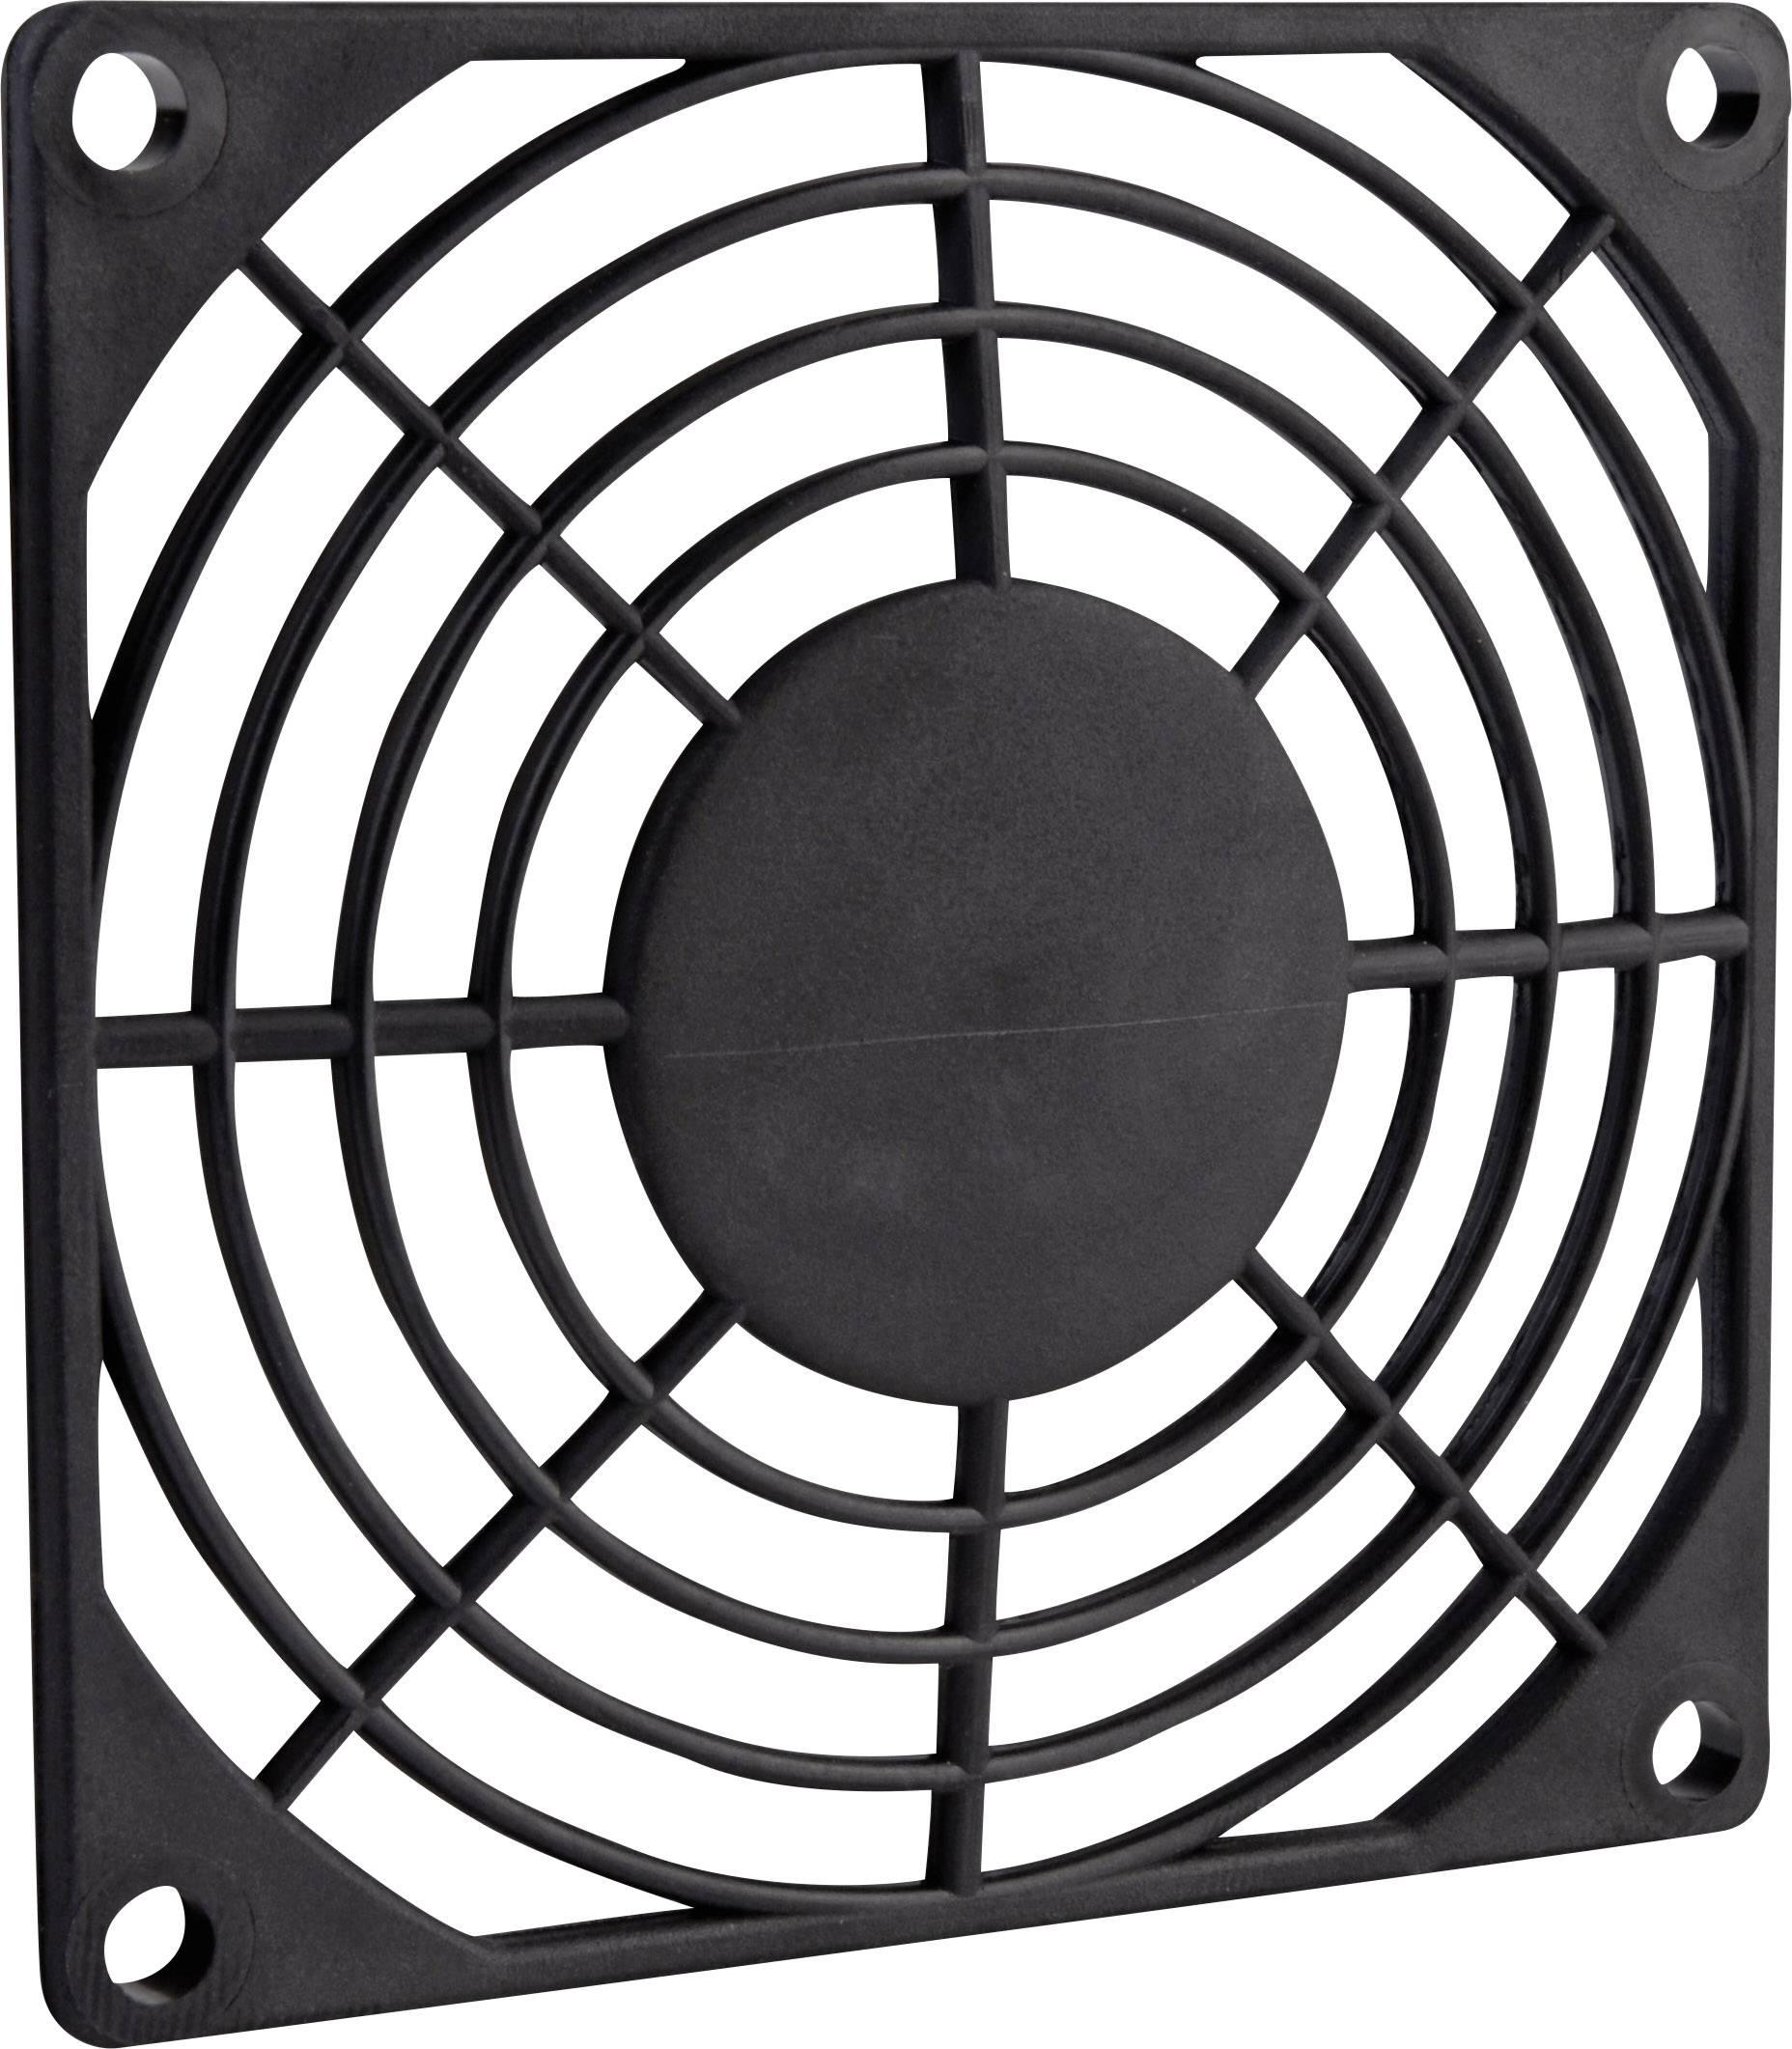 Kryt ventilátora Wallair, 80 x80 mm, čierny